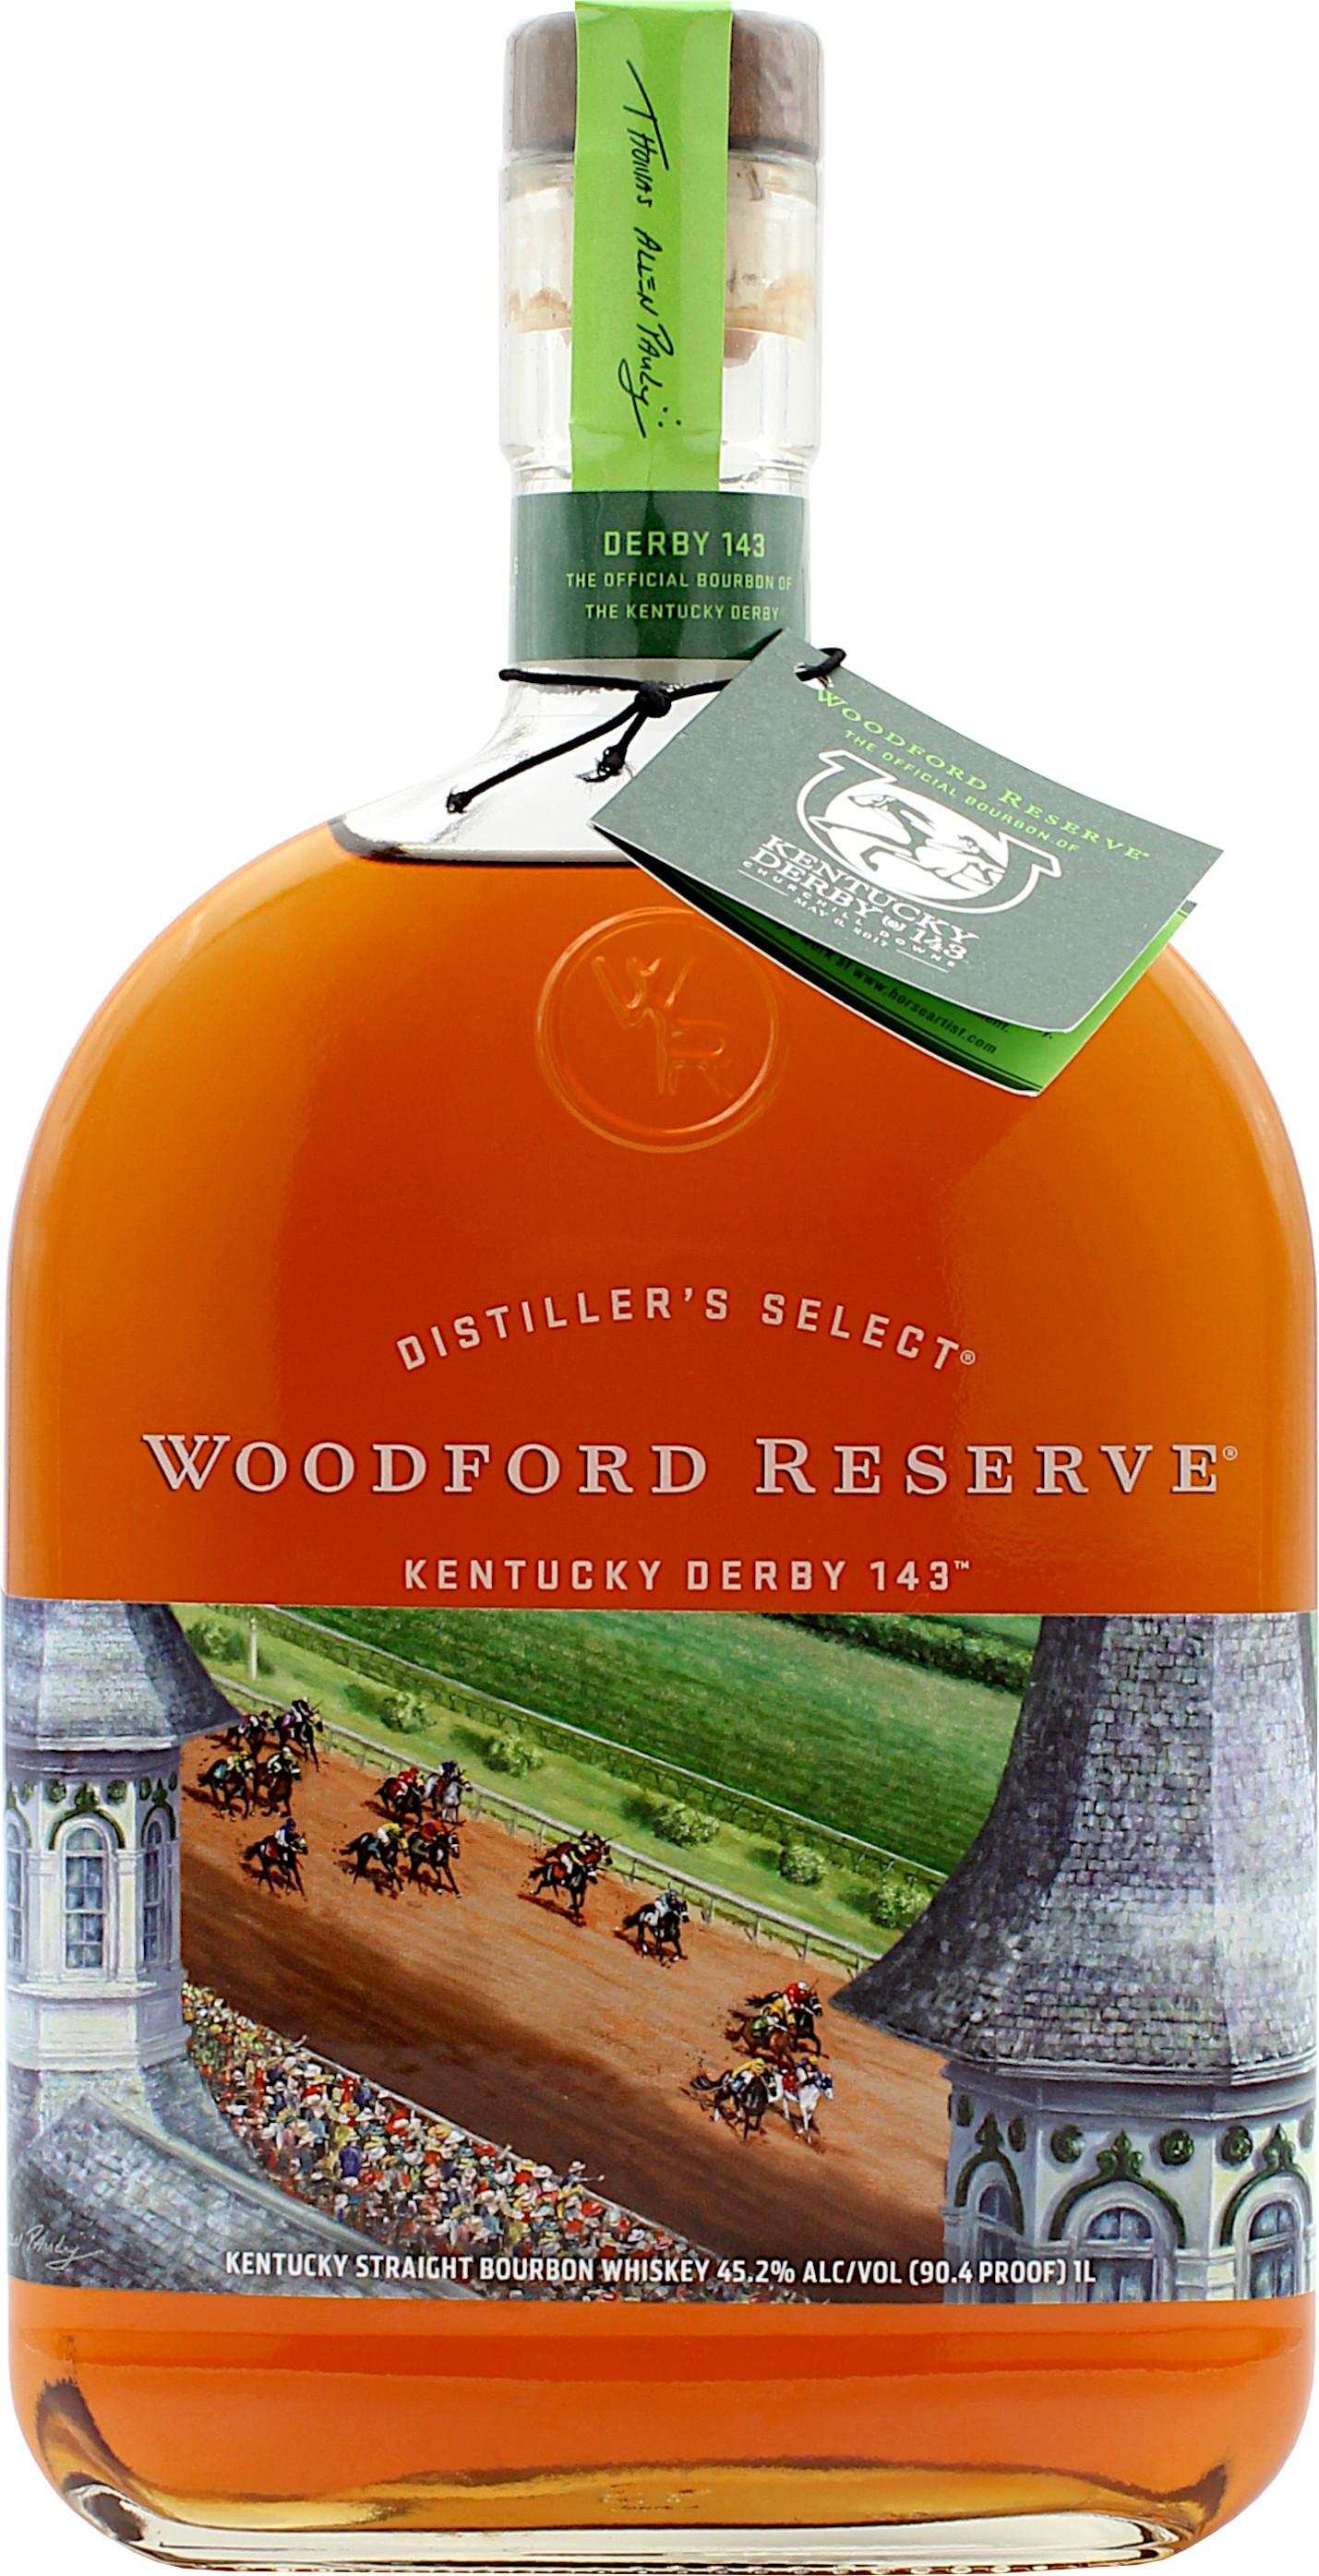 Woodford Reserve Distiller's Select Limited Derby Edition 255 255.25 25 Liter